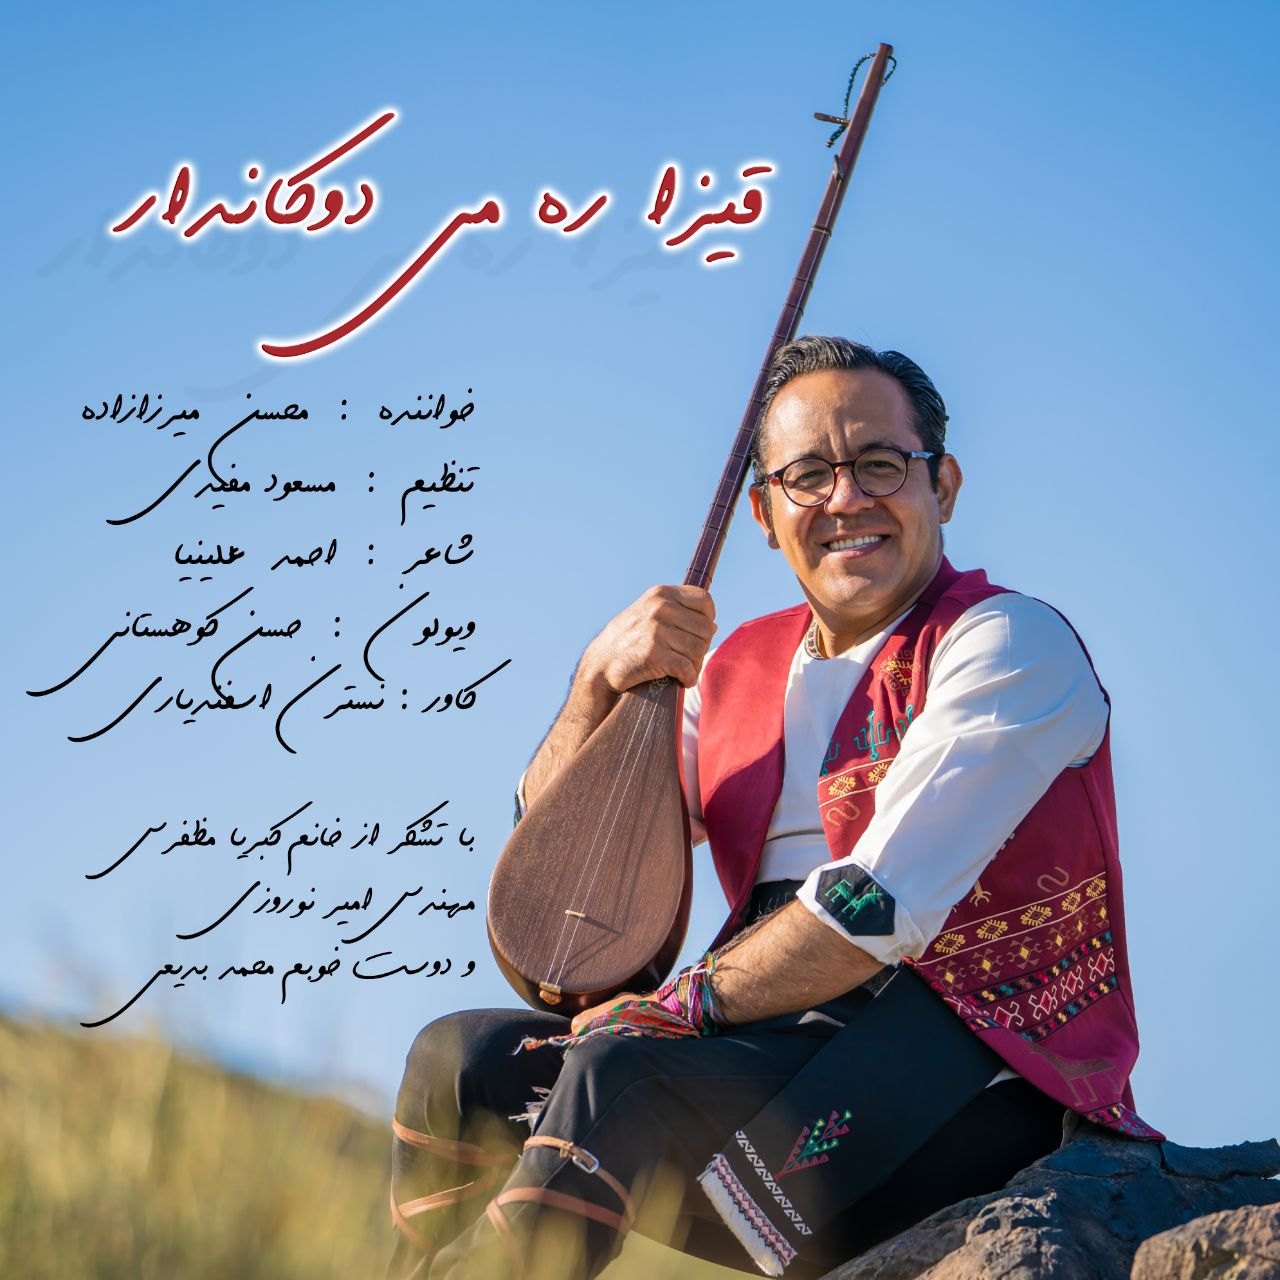 789 MohsenMirzazadeh GhizeRameDokandar آهنگ قیزا رمه دوکان دار از محسن میرزازاده